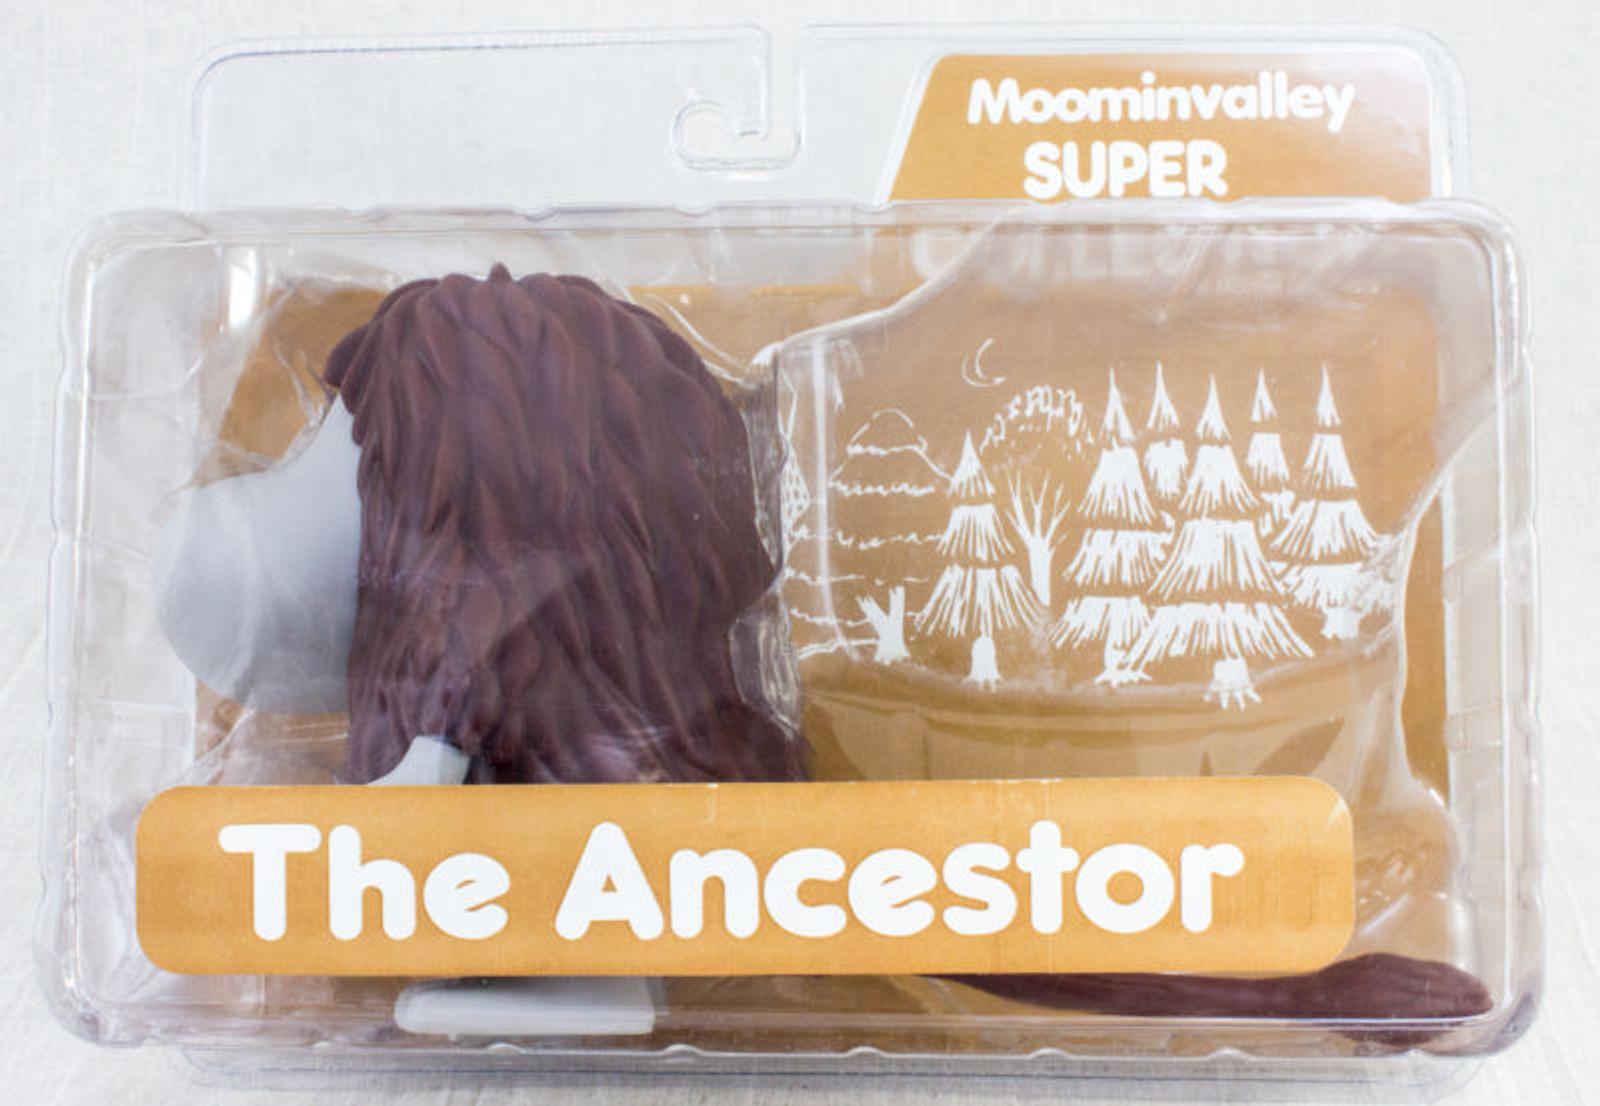 RARE The Ancestor PVC Figure Moomin valley Super Collection Sekiguchi STOC JAPAN